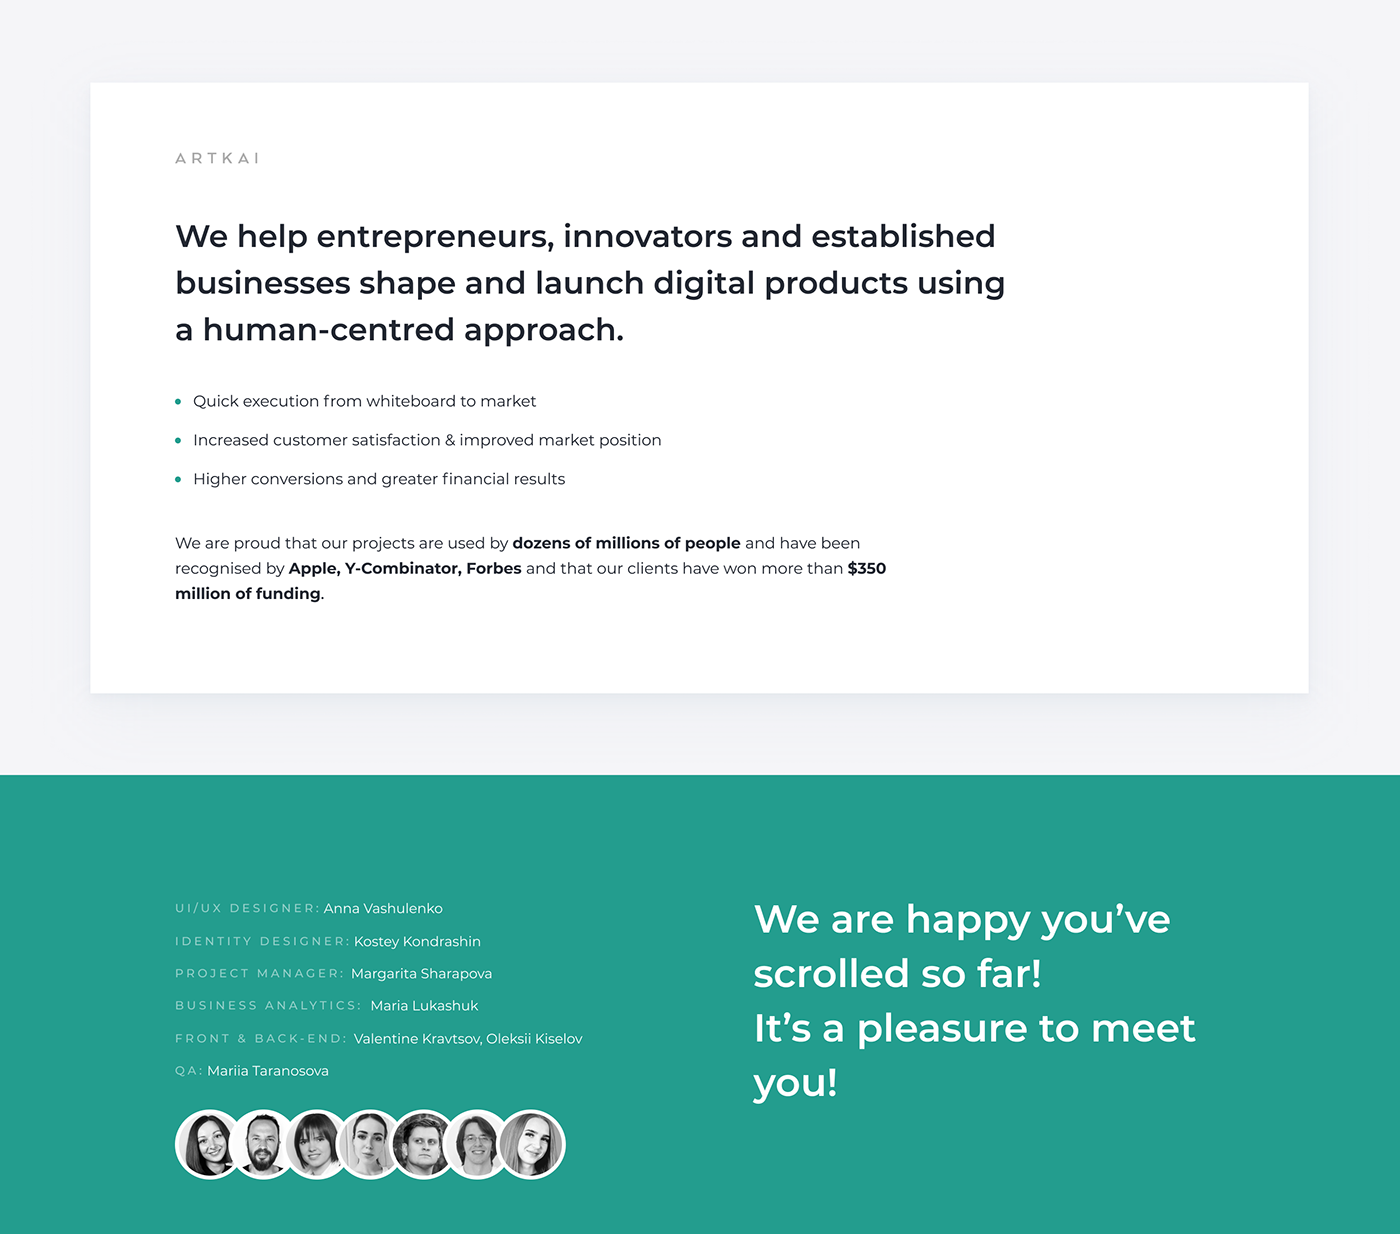 artkai branding  charity app Lean Mobile app Mobile UX Startup Startup UX UI visual design